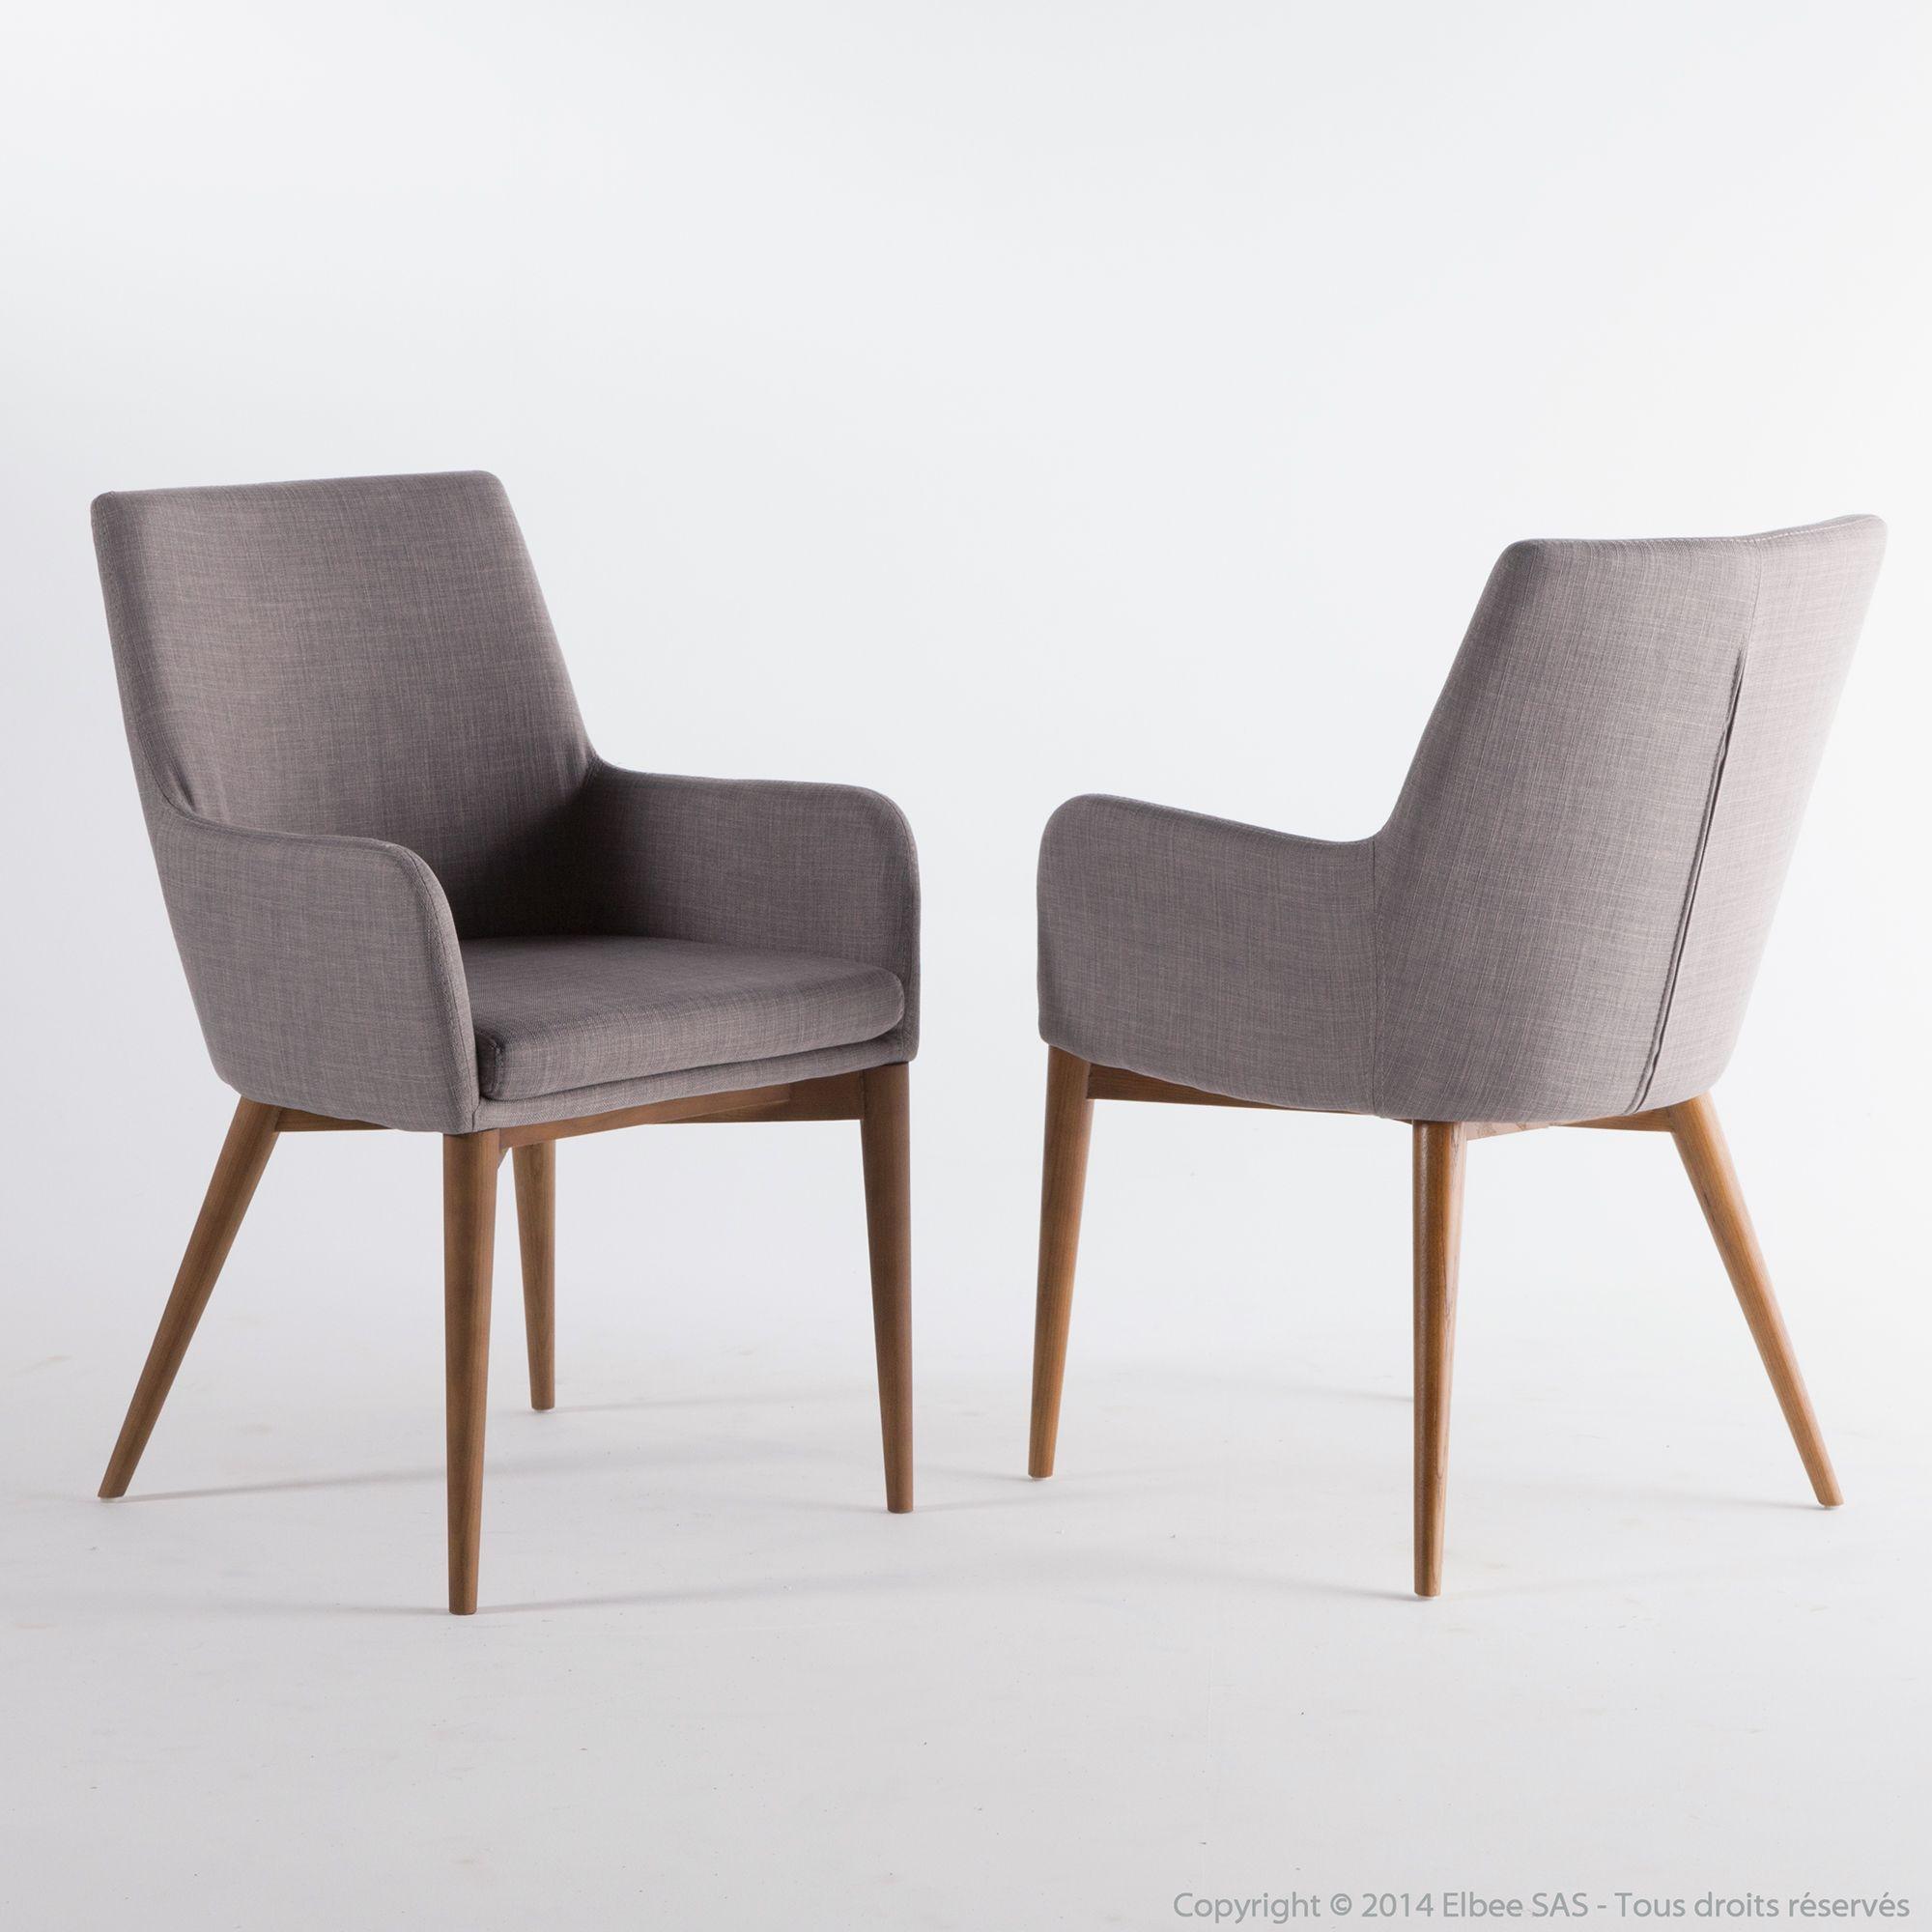 Chaise A Accoudoir Scandinave